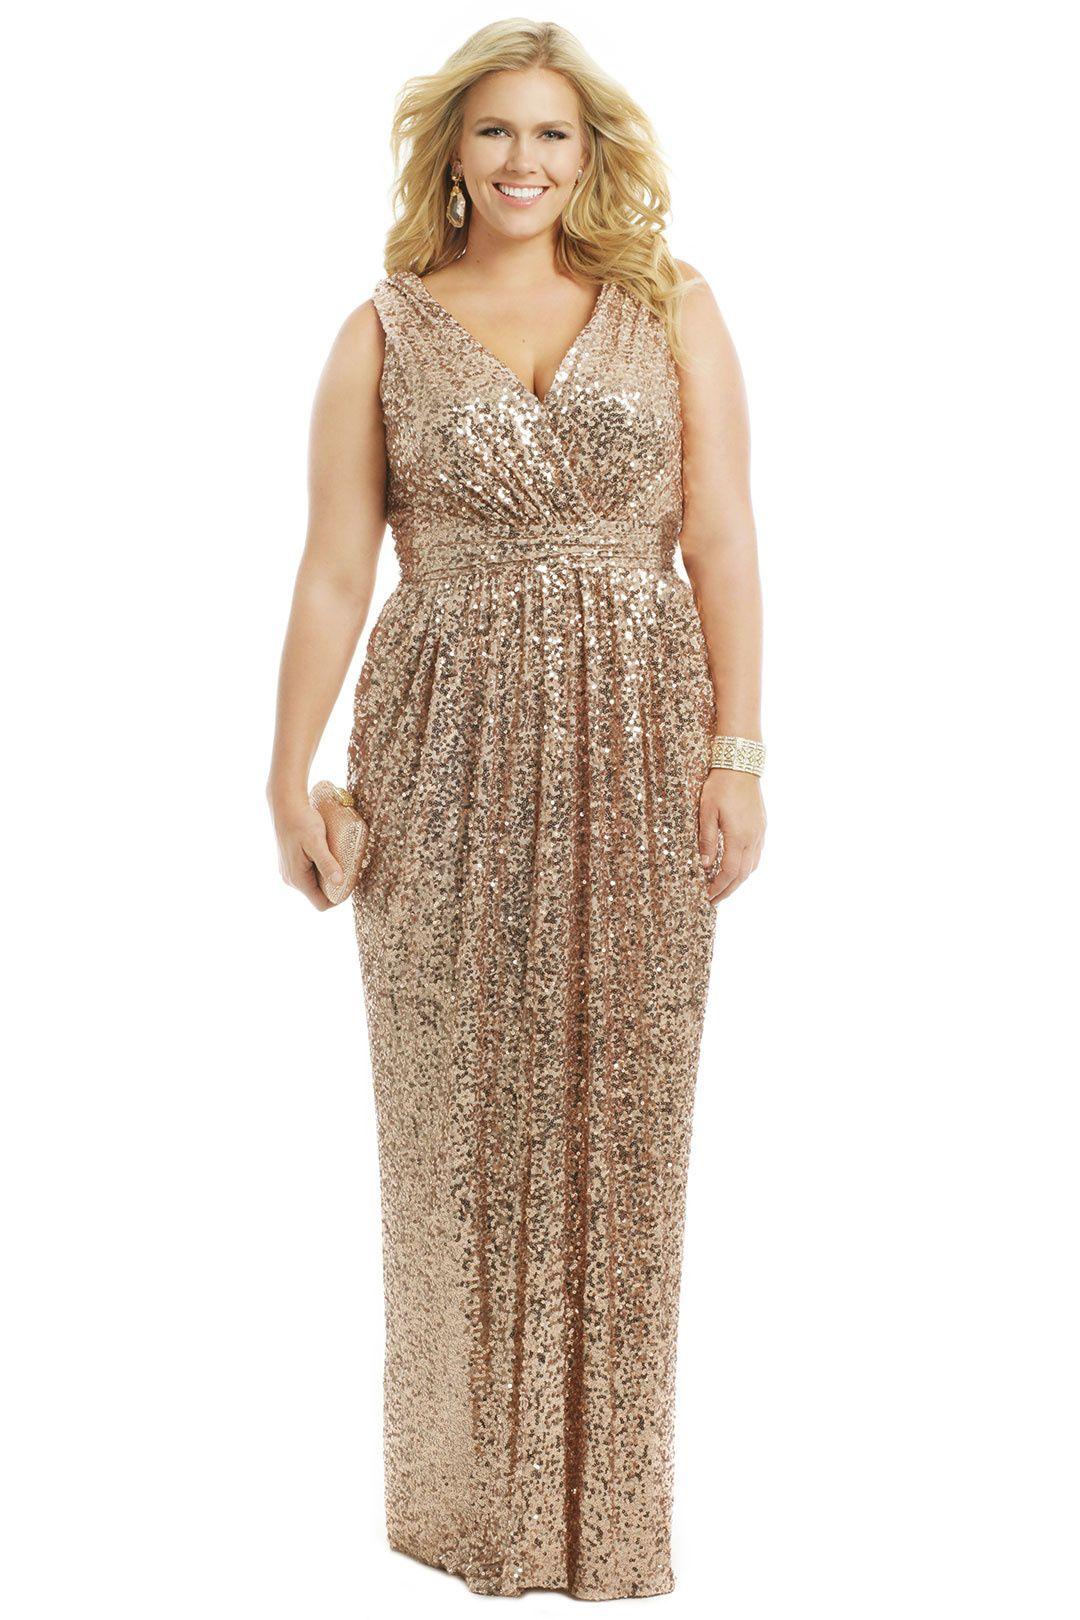 1000  images about Long Gold Bridesmaids Dresses on Pinterest  J ...